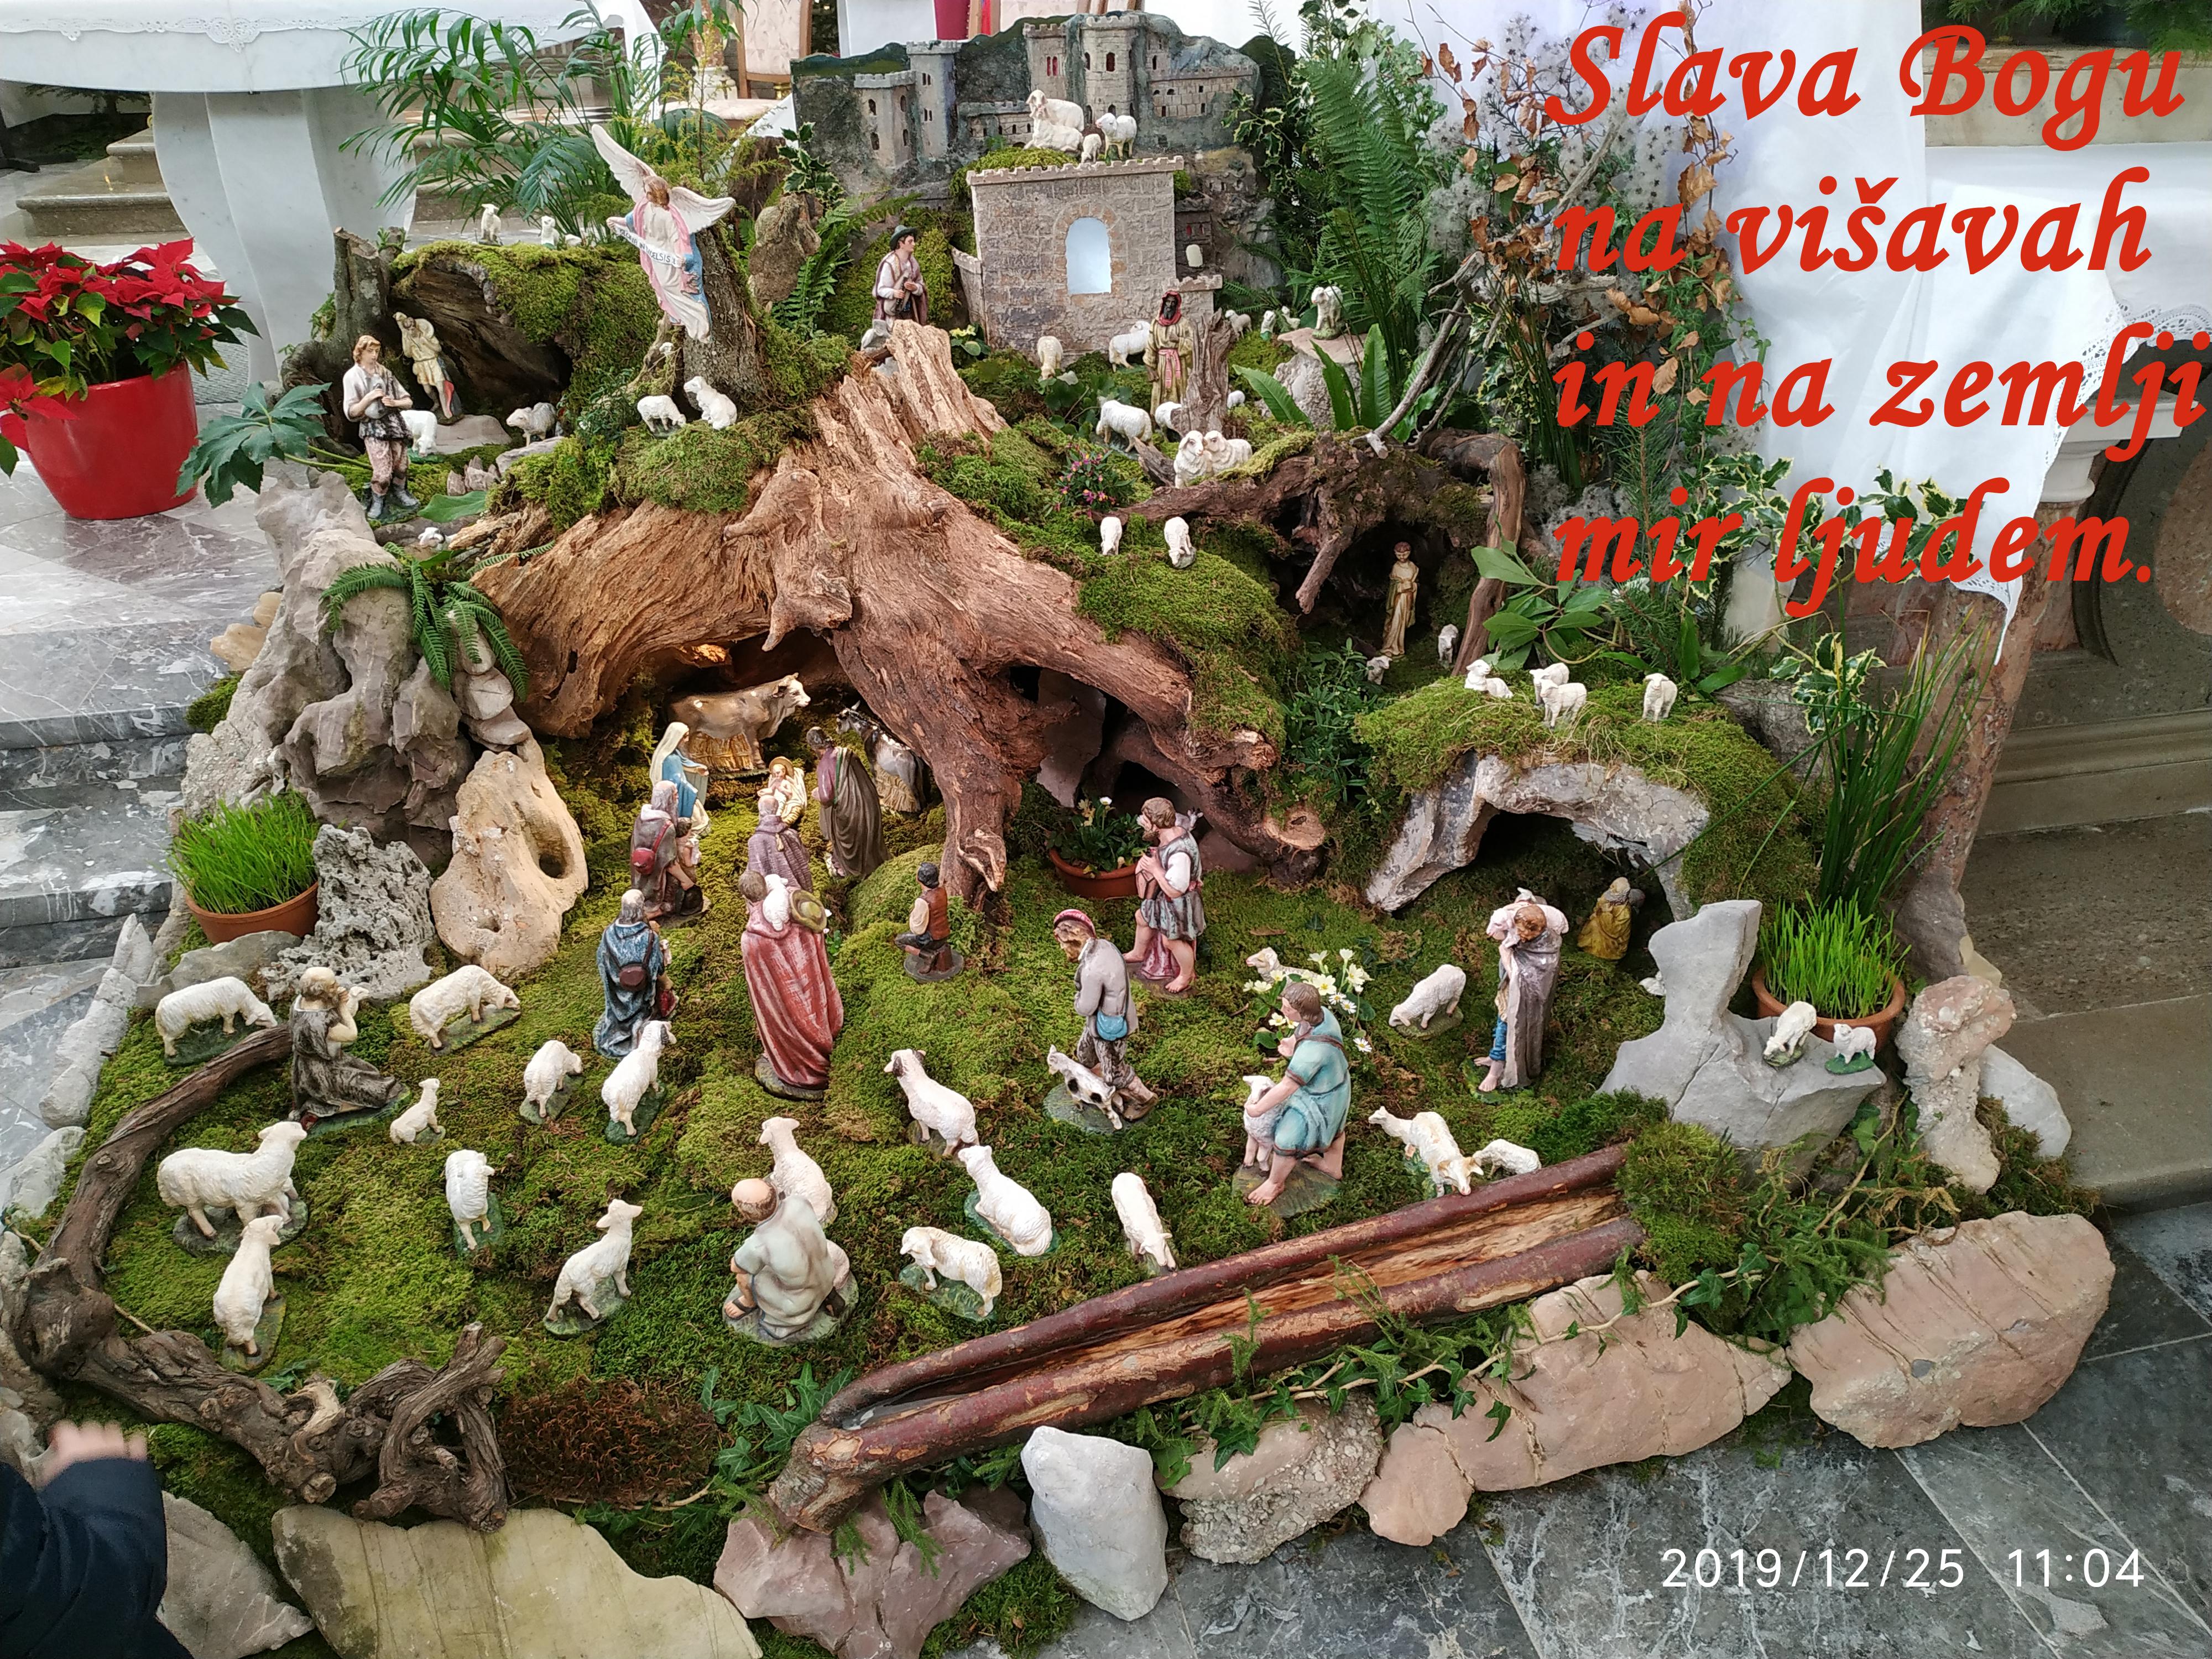 Blagoslovljen Bozic Jasčlice Rovte